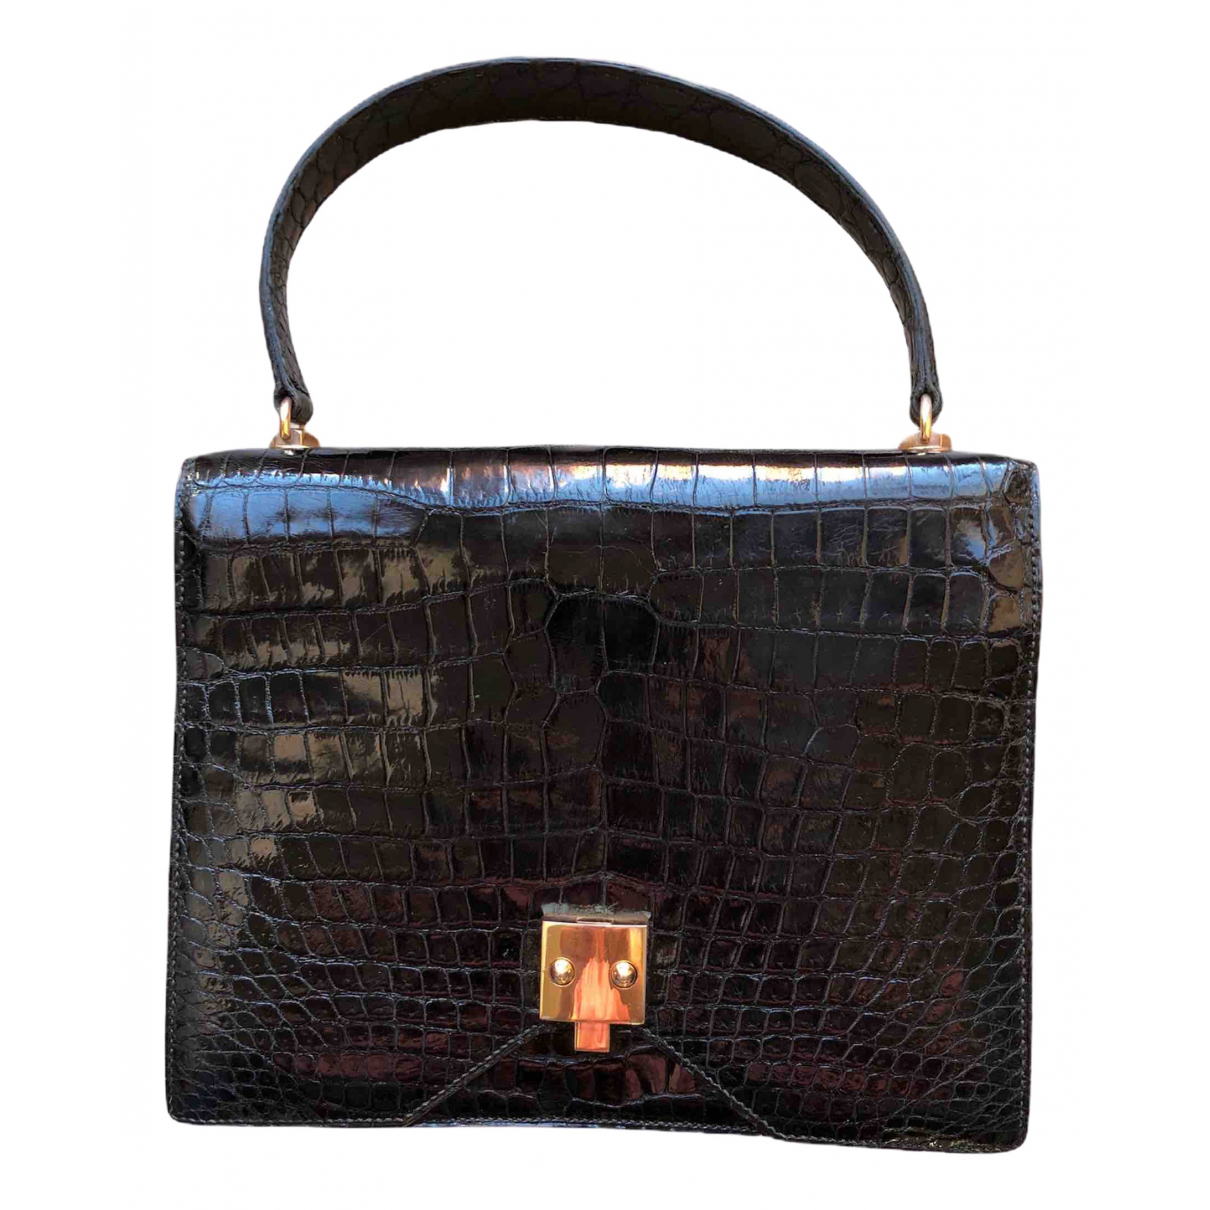 Hermès \N Black Crocodile handbag for Women \N